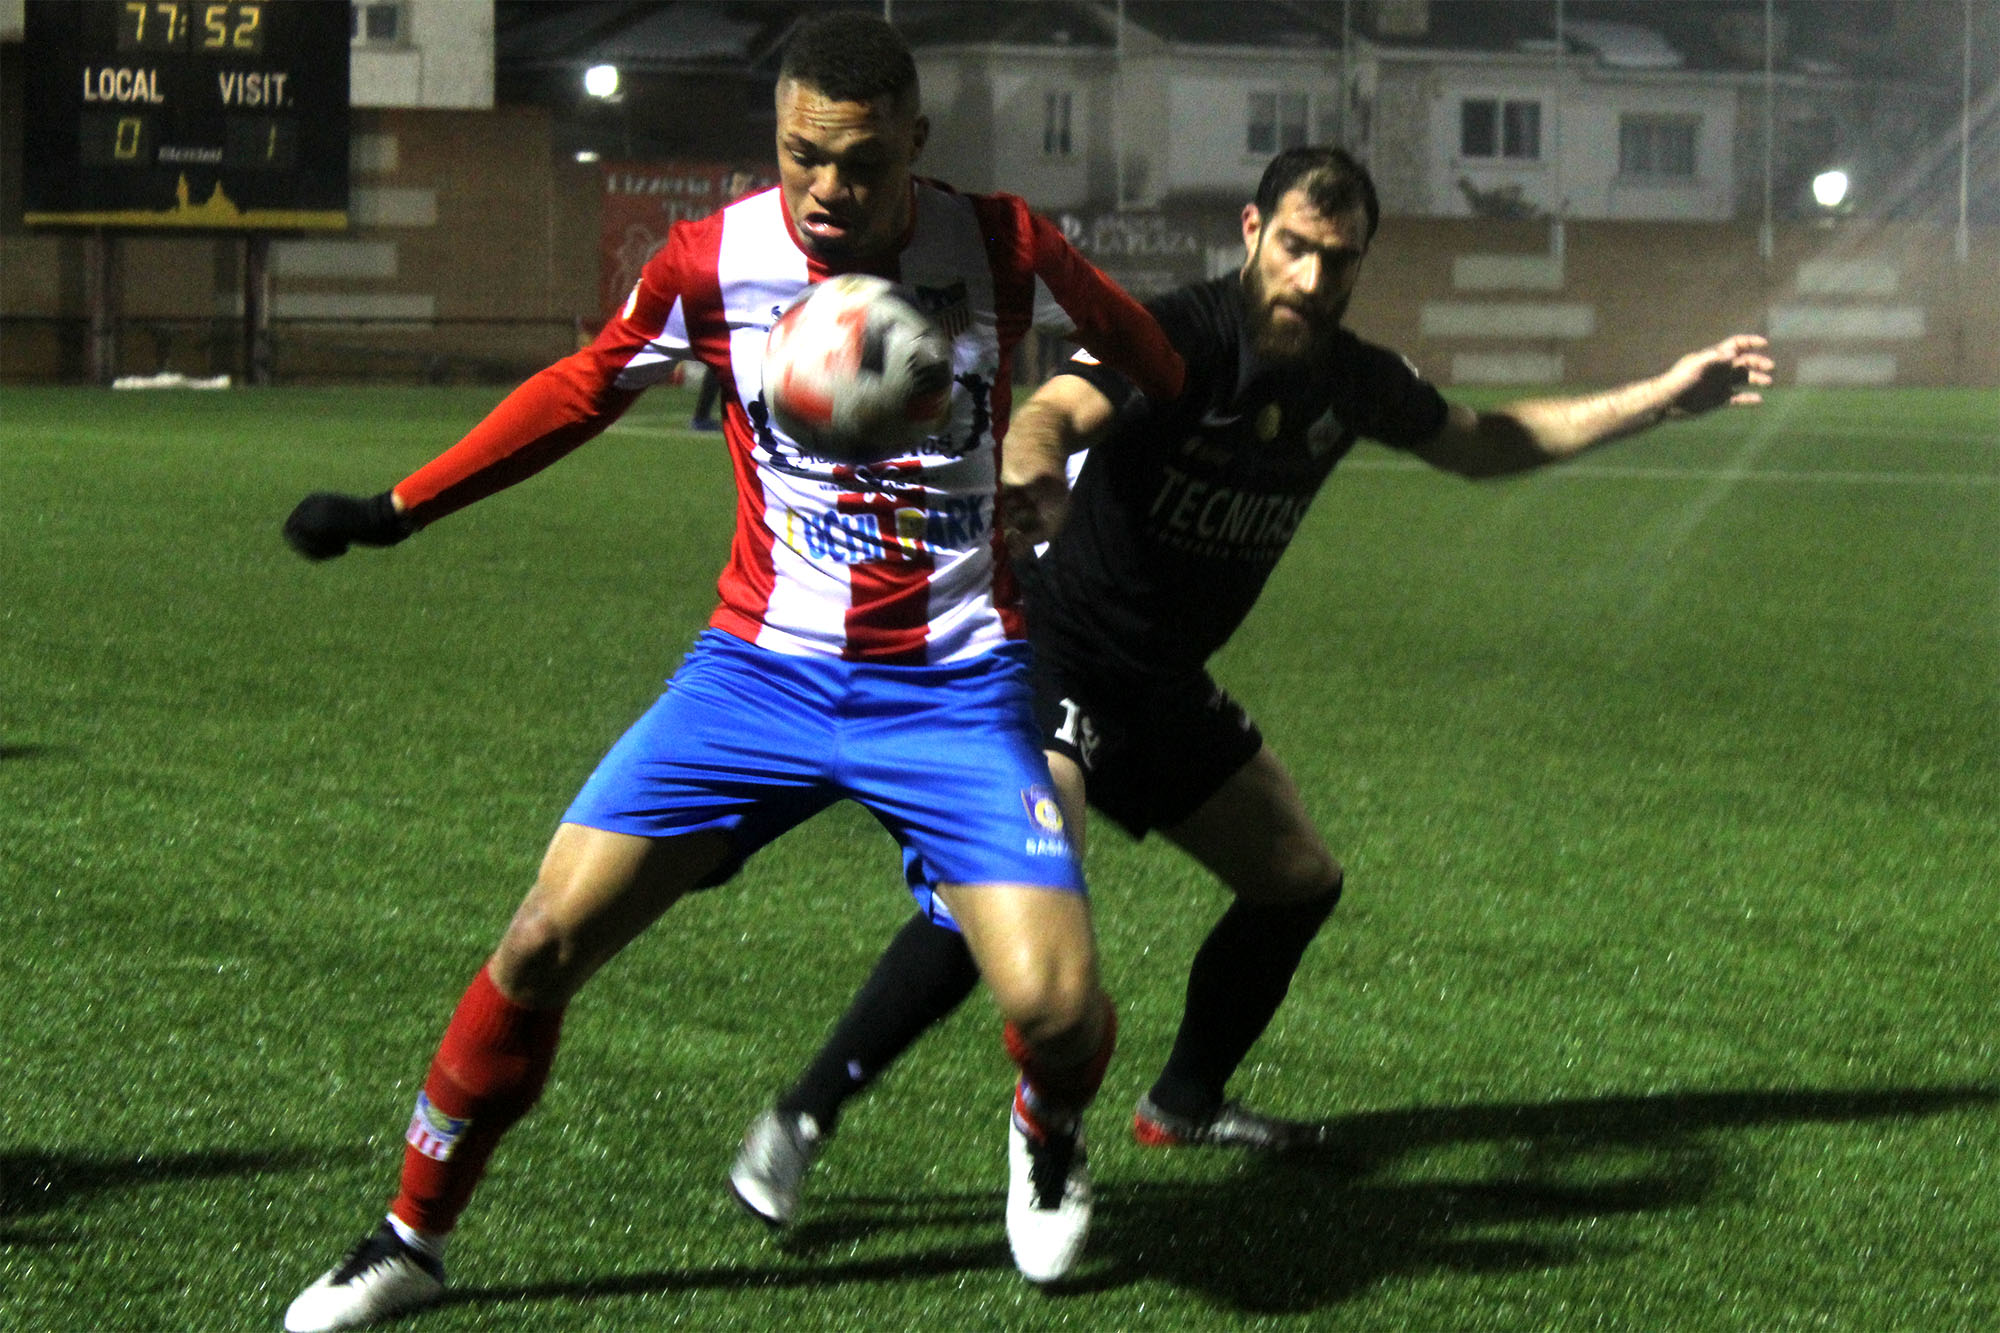 VÍDEO / Andrés Santana (RFFM) - Navalcarnero - UD Sanse 1-1 (Segunda B - Subgrupo 5A - Jornada 10)